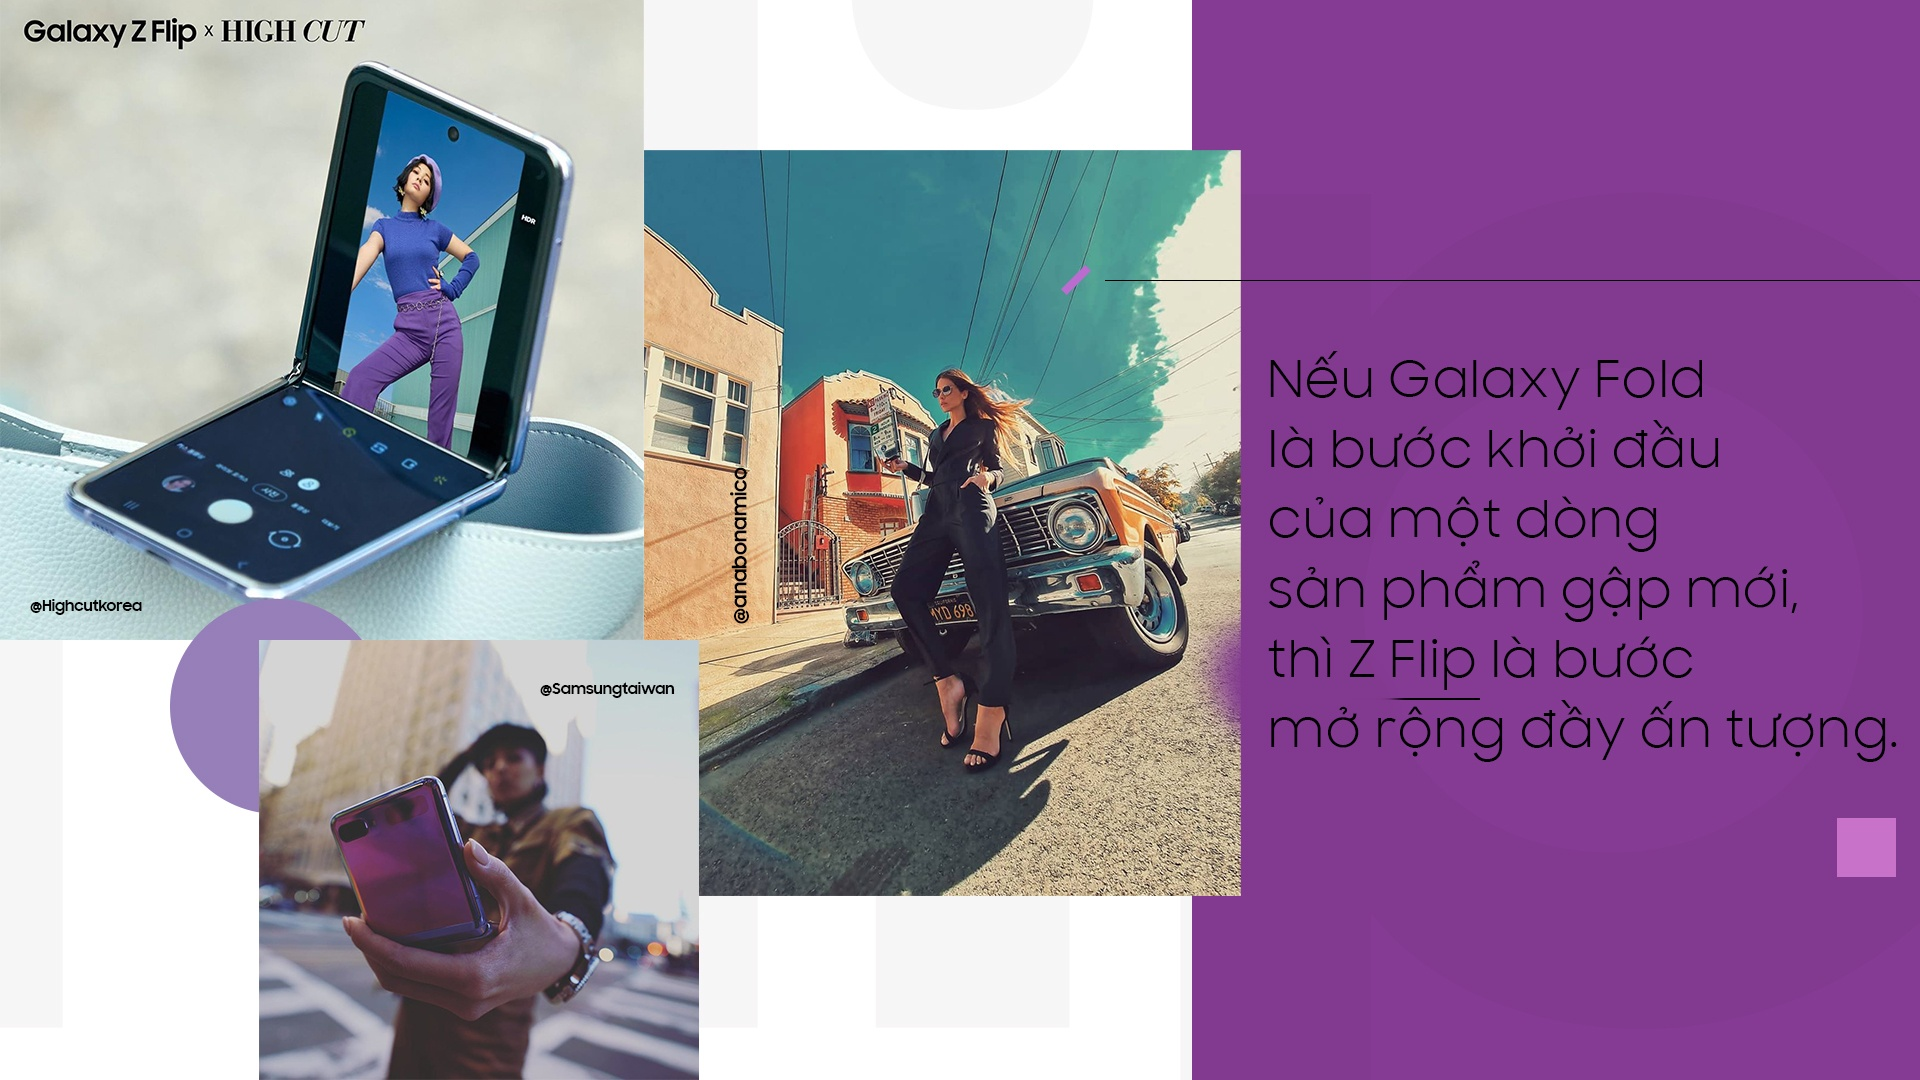 Galaxy Z Flip anh 1